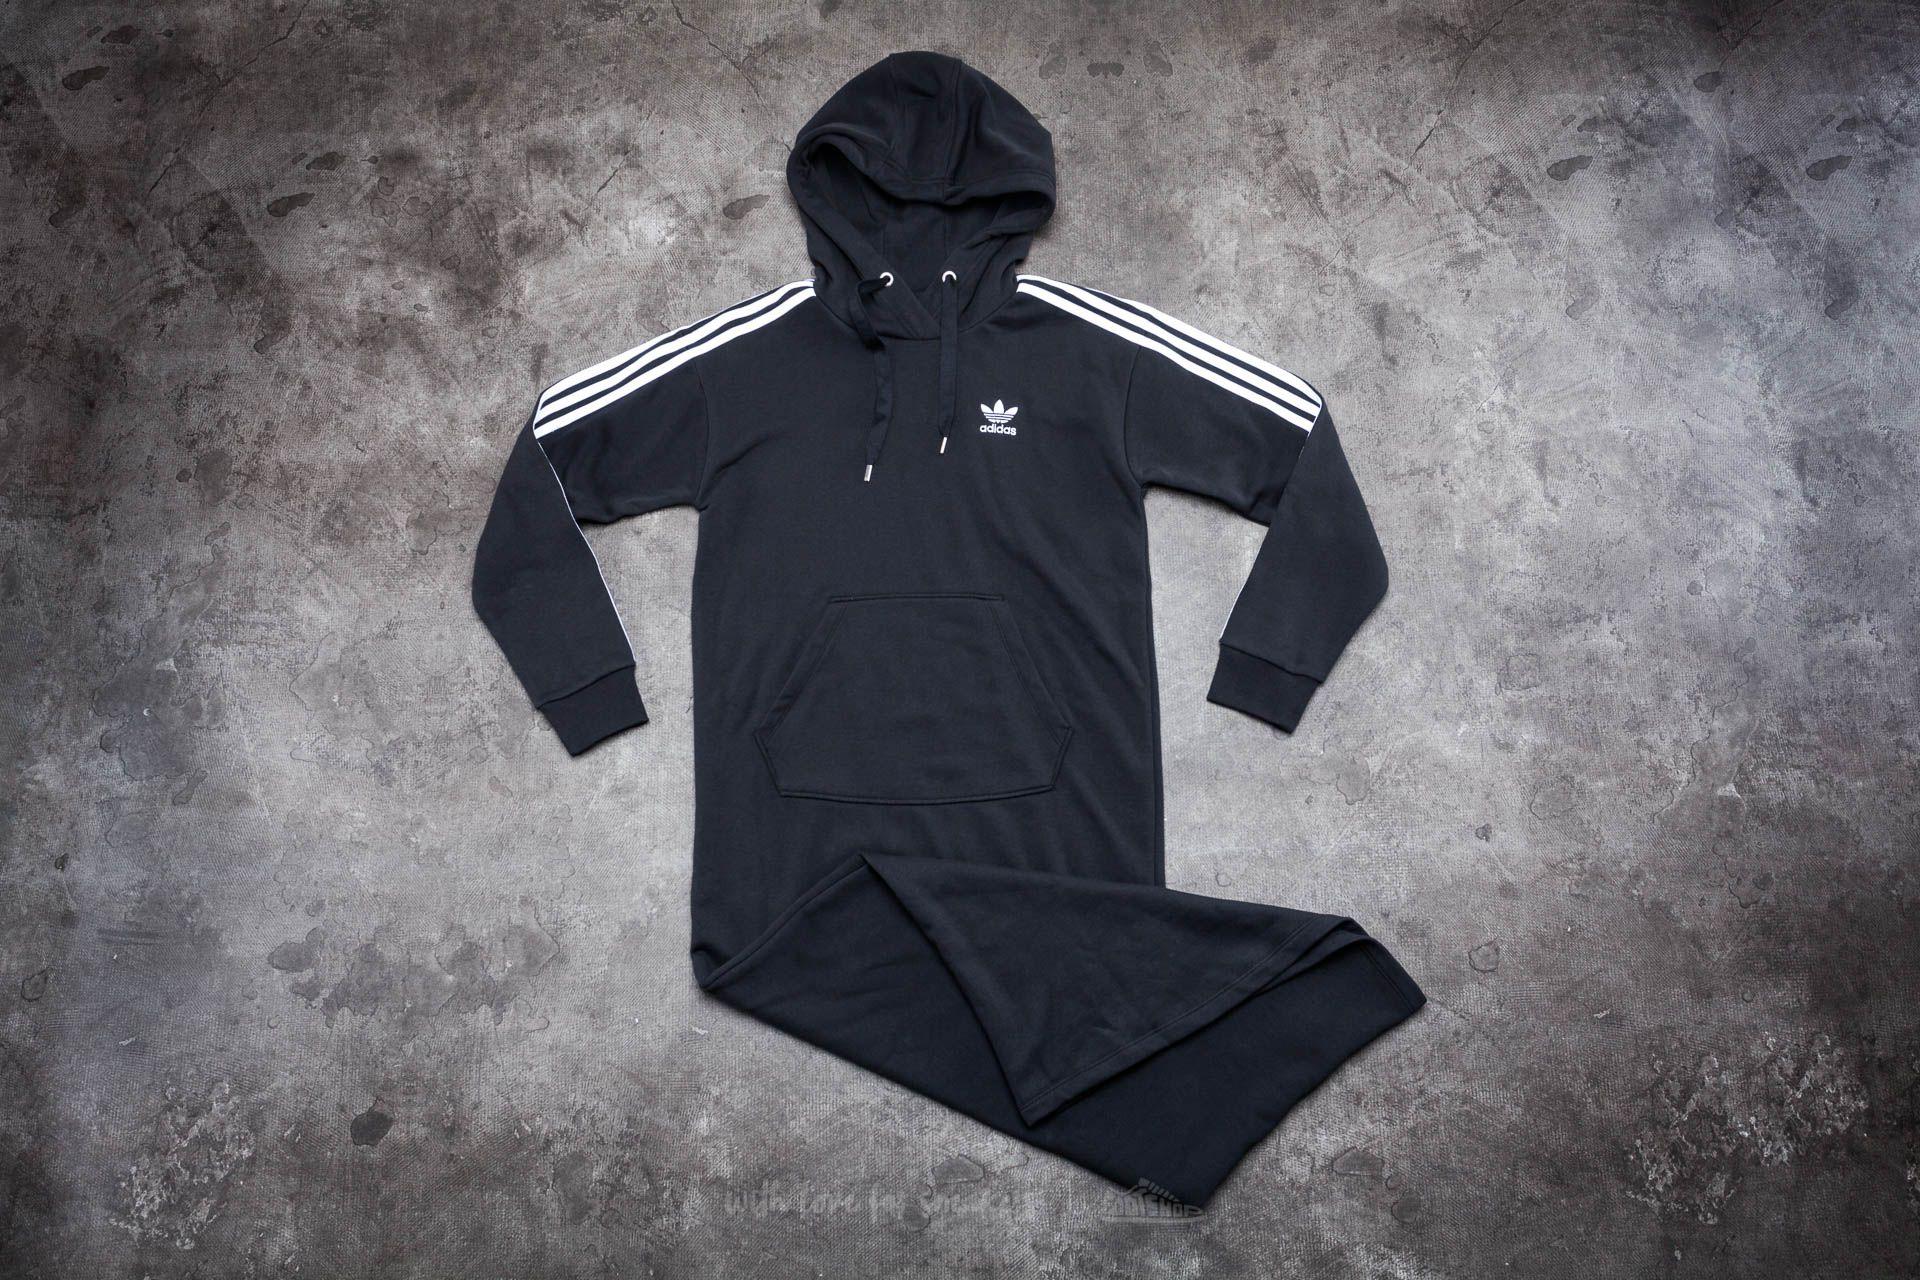 adidas 3 Stripes Hoody Dress Black - 14069